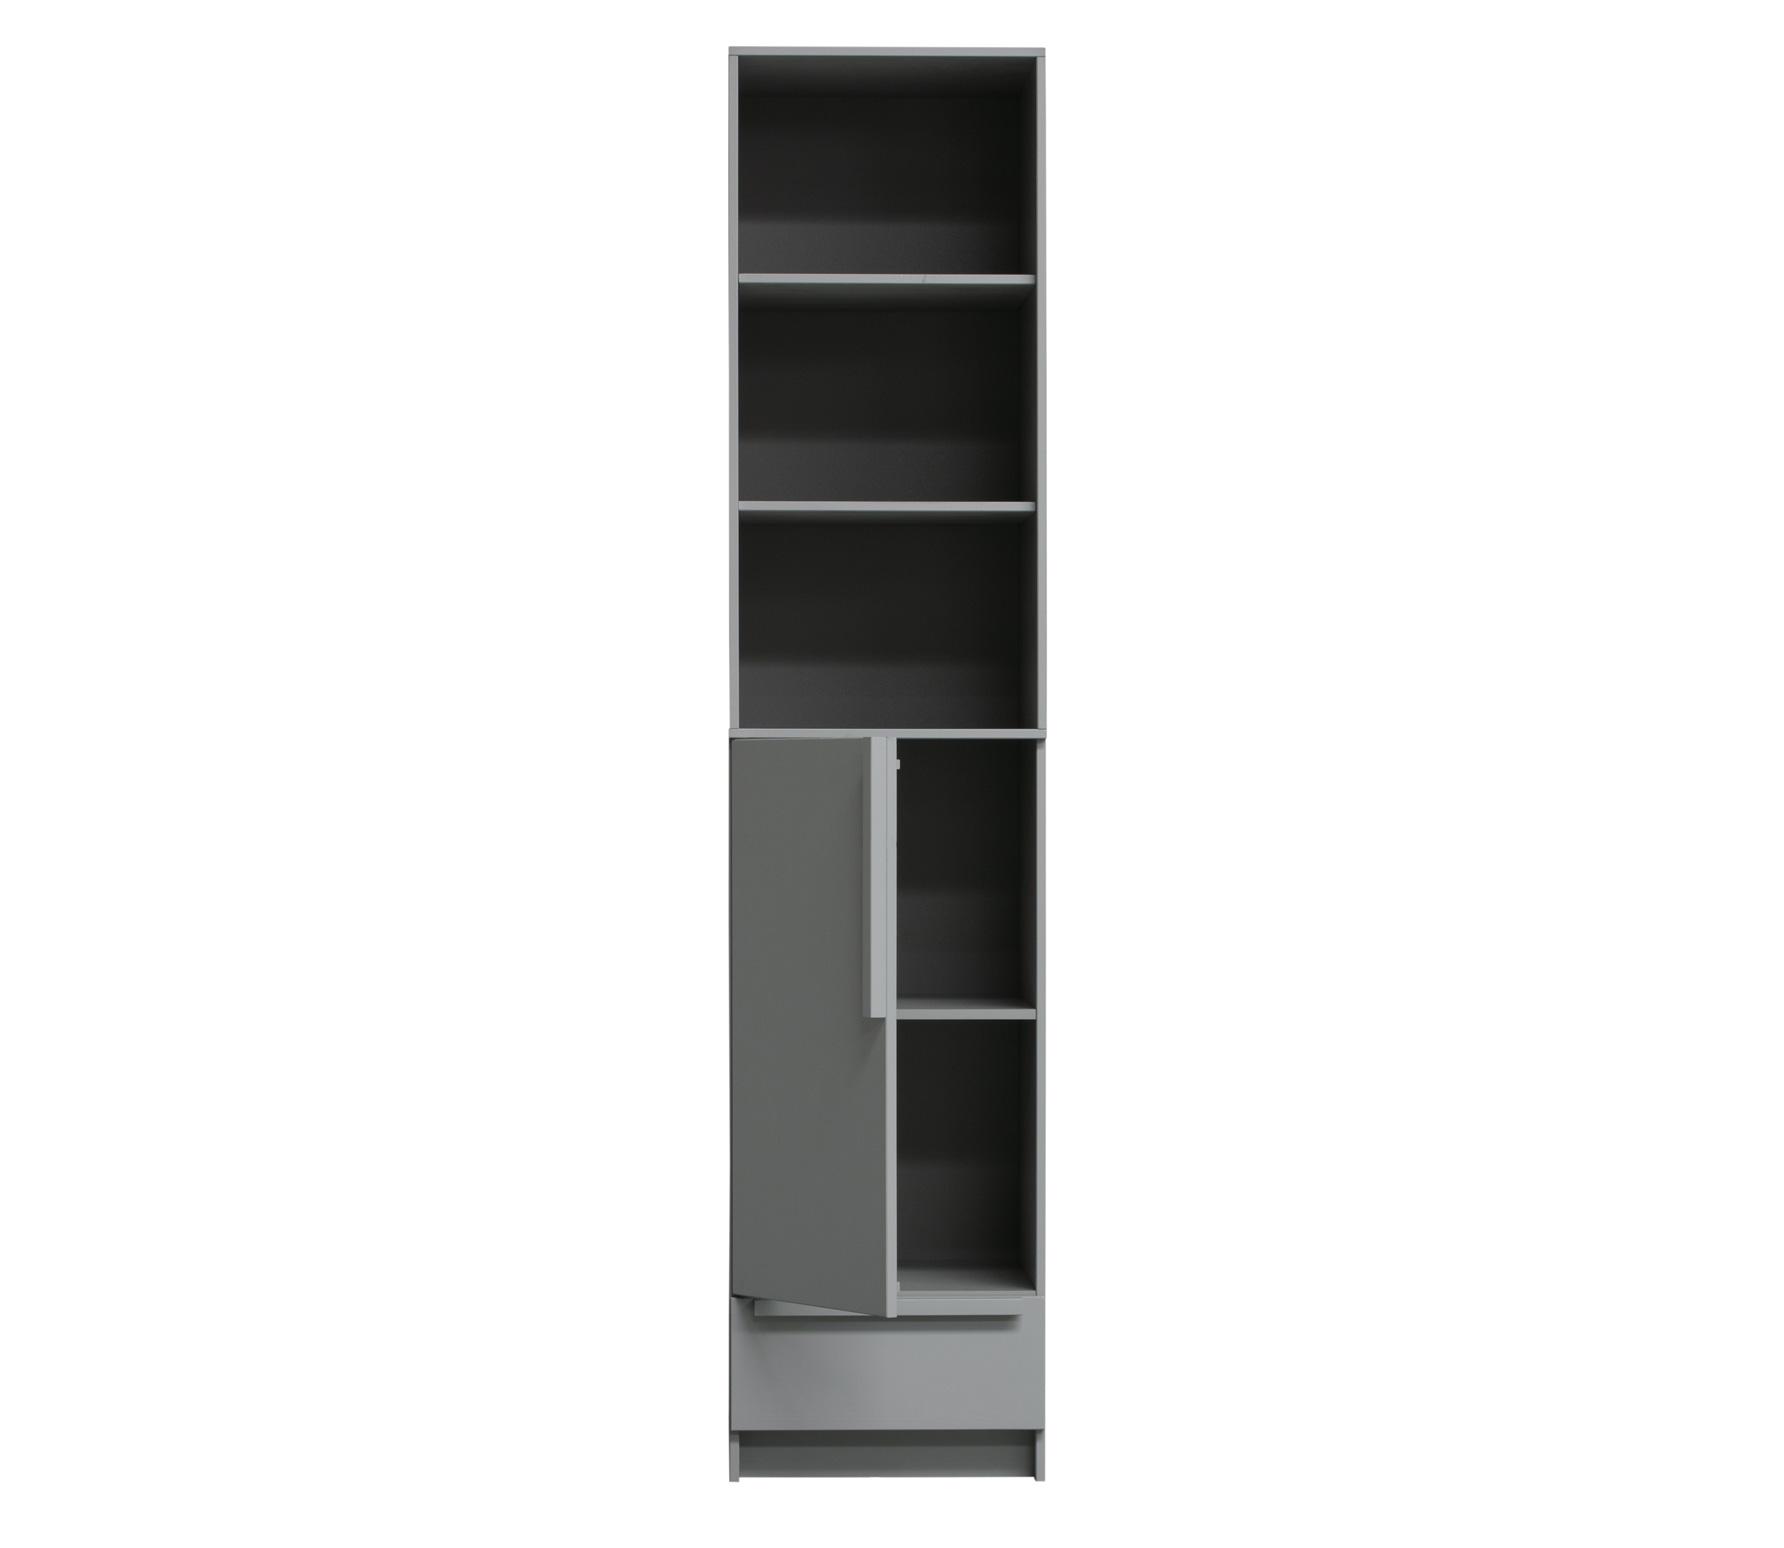 Boekenkast Tipi betongrijs kopen? buffet vitrinekasten   Karwei